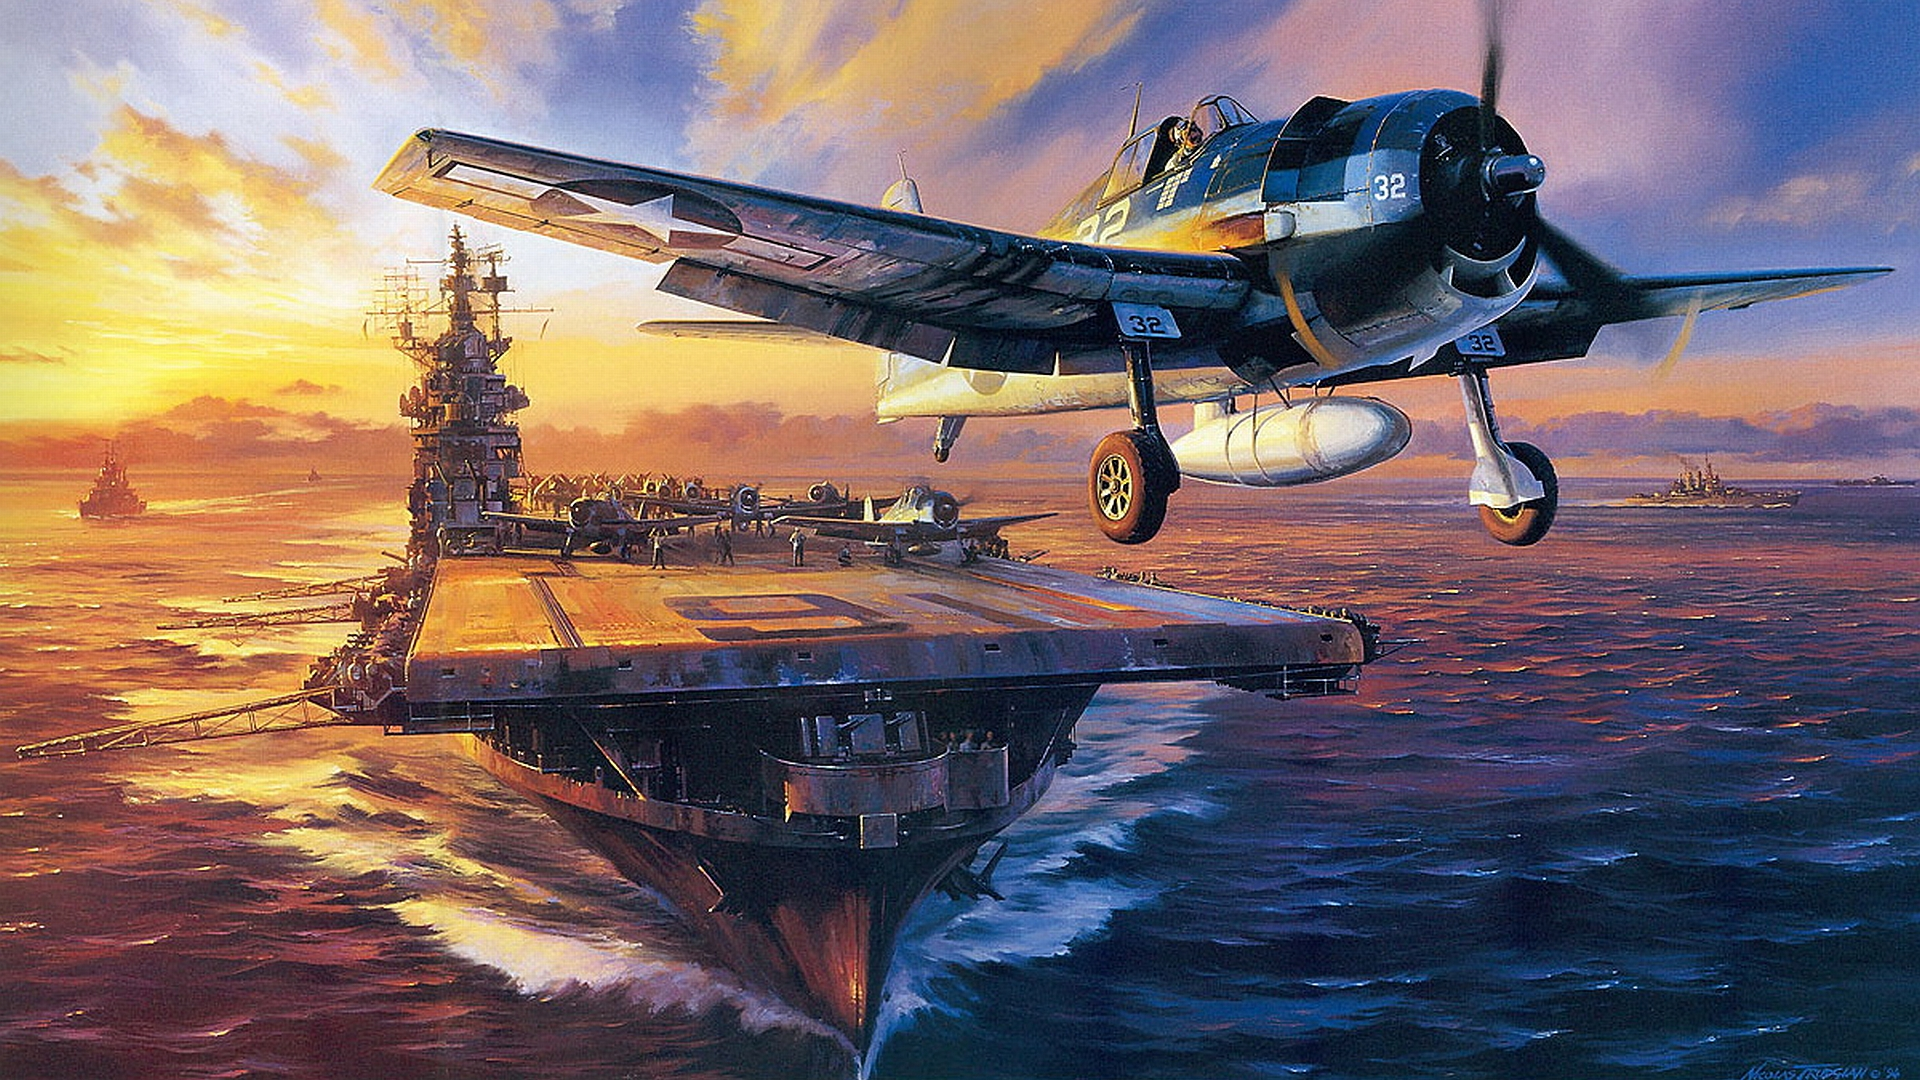 Картинки самолетов танков